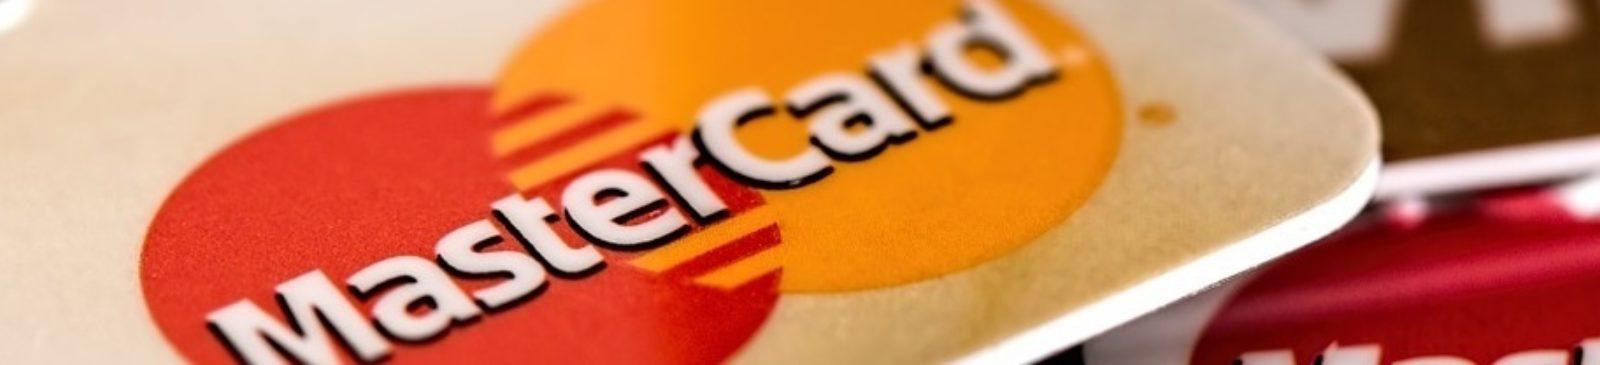 Credit Card 851506 1280 Blog